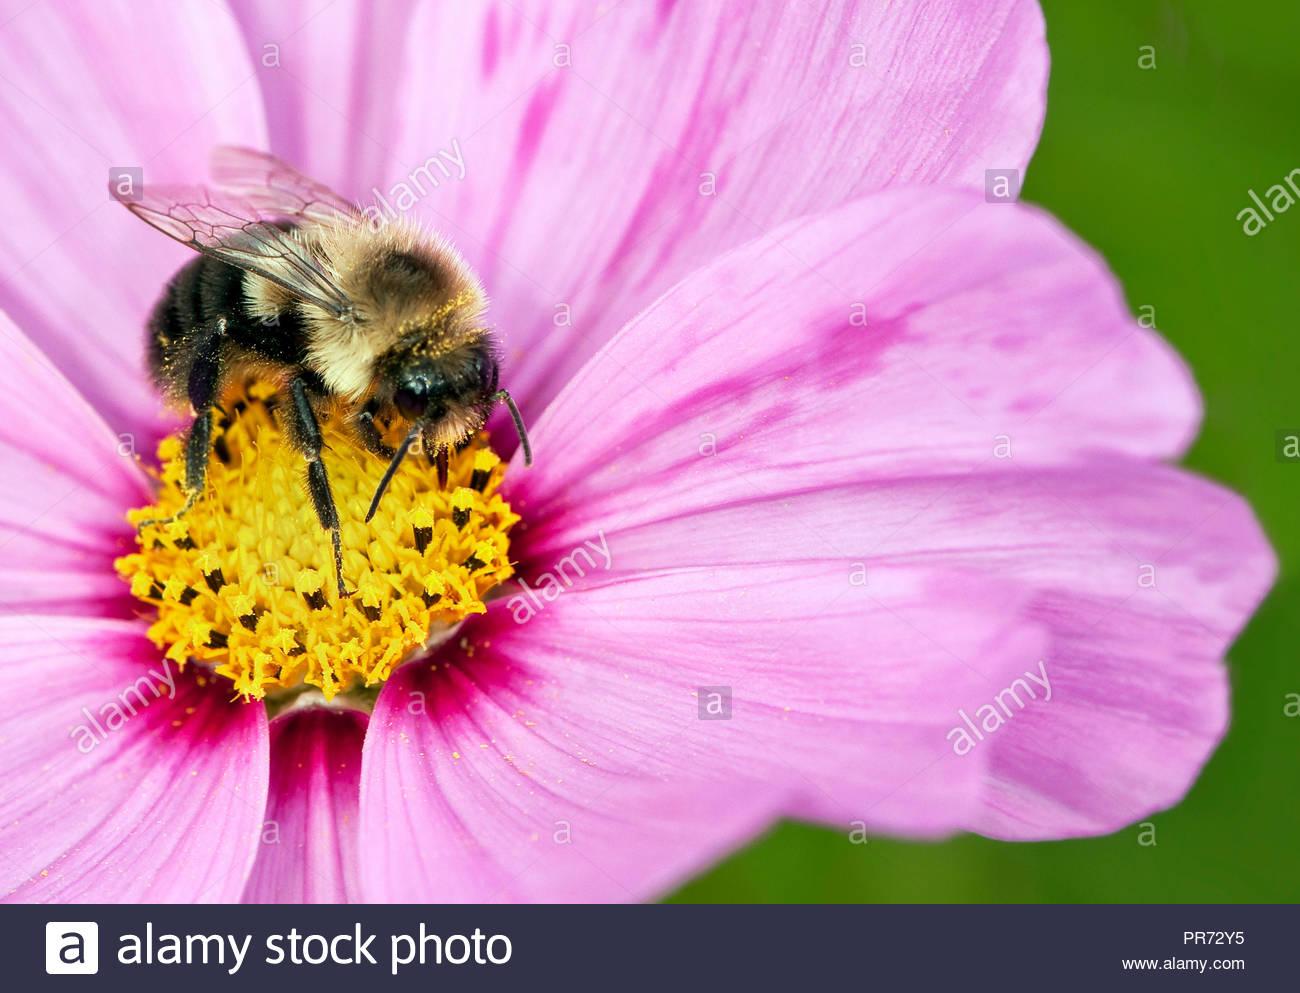 macro shot of bumble bee on pink flower - Stock Image